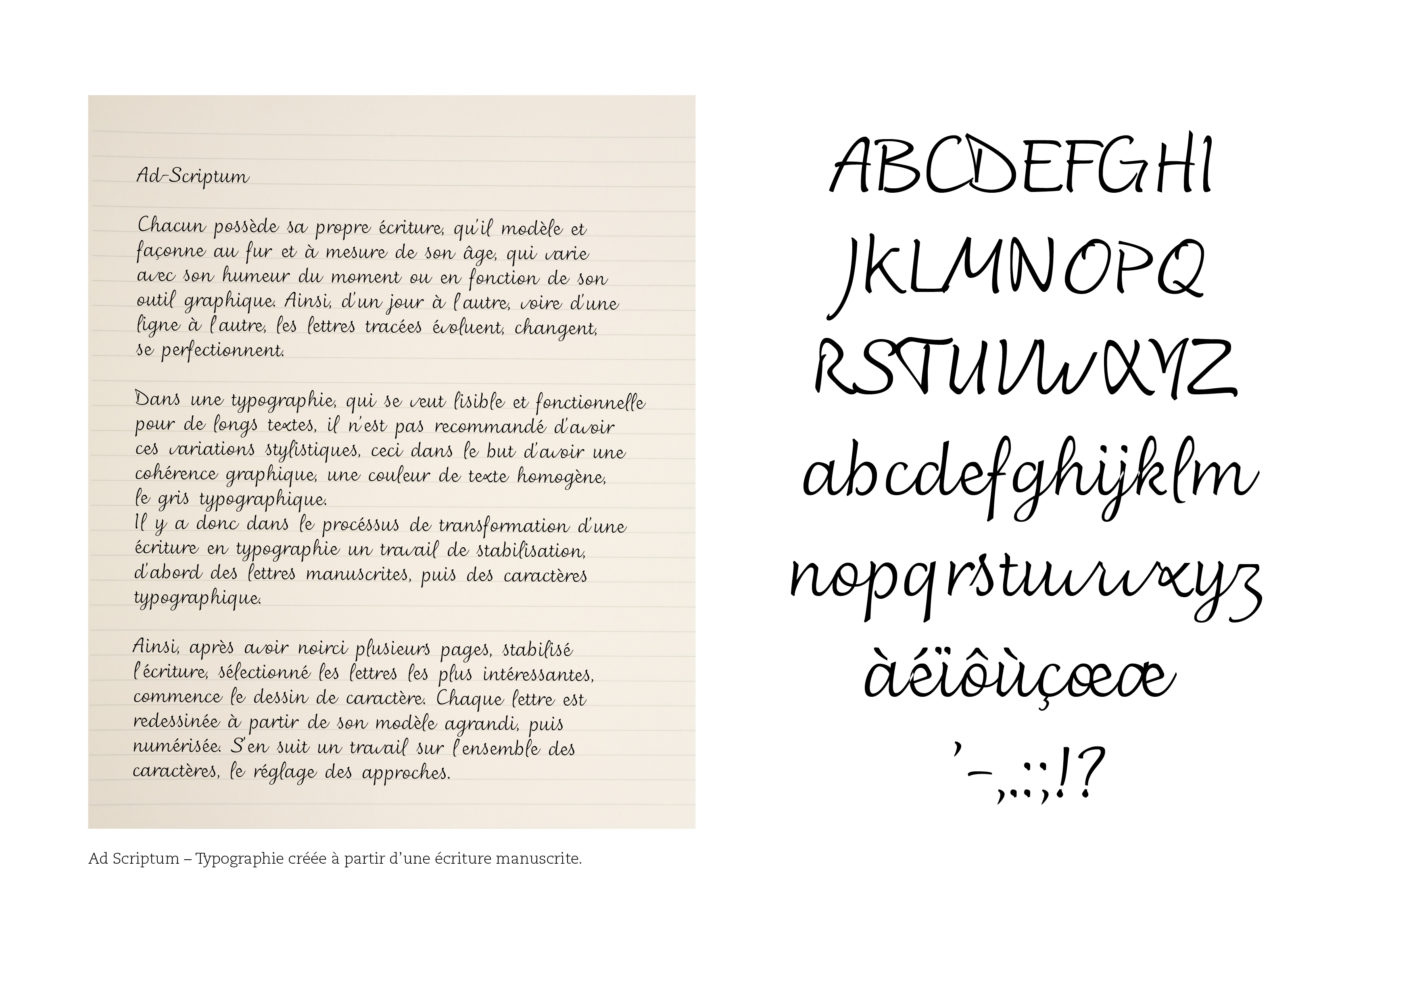 AA-WP-Graphisme-Typographie-Ad Scriptum